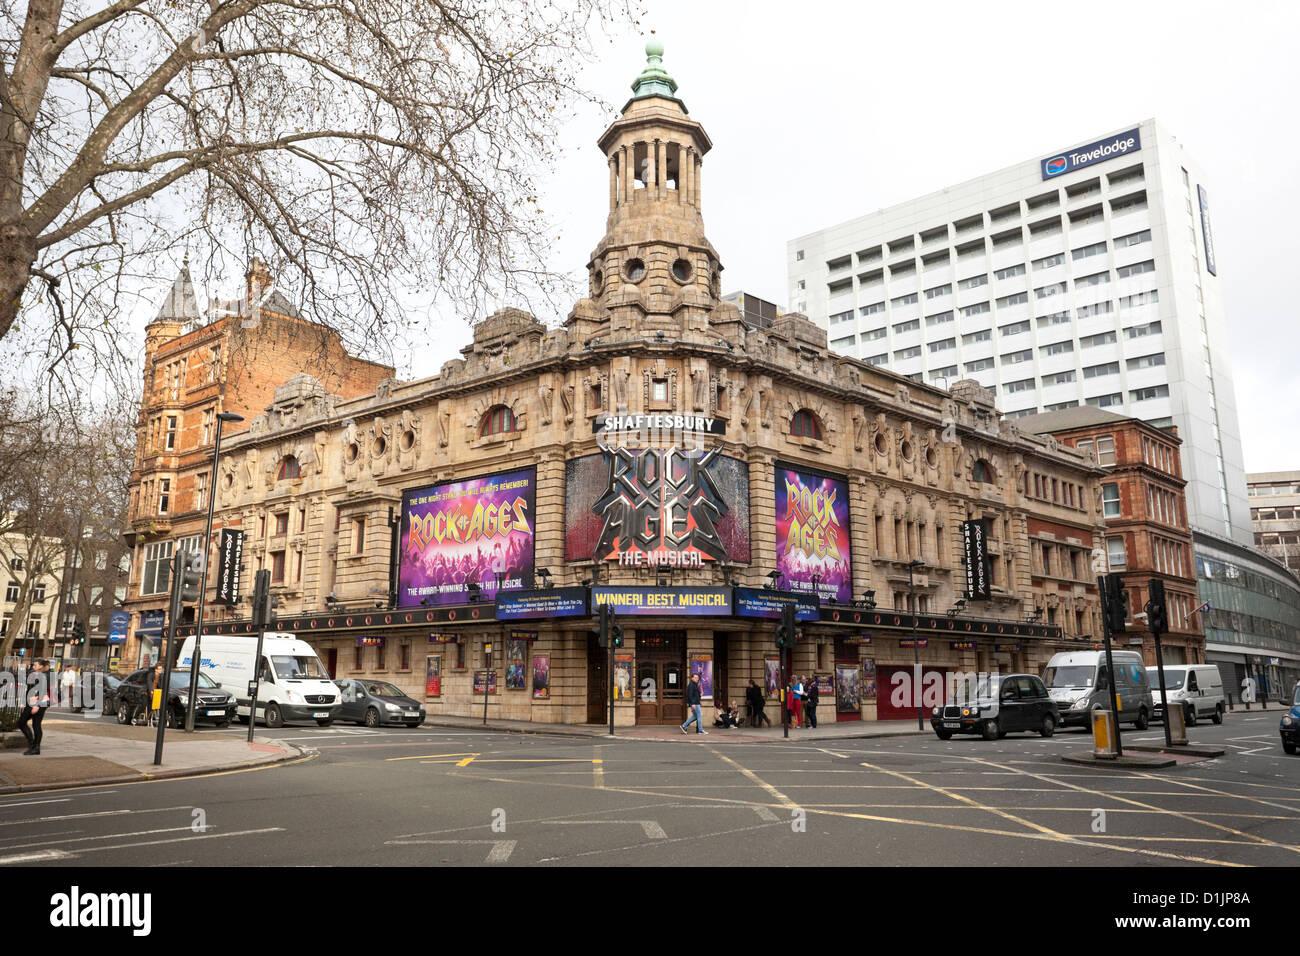 The Shaftesbury Theatre, London, England, UK - Stock Image